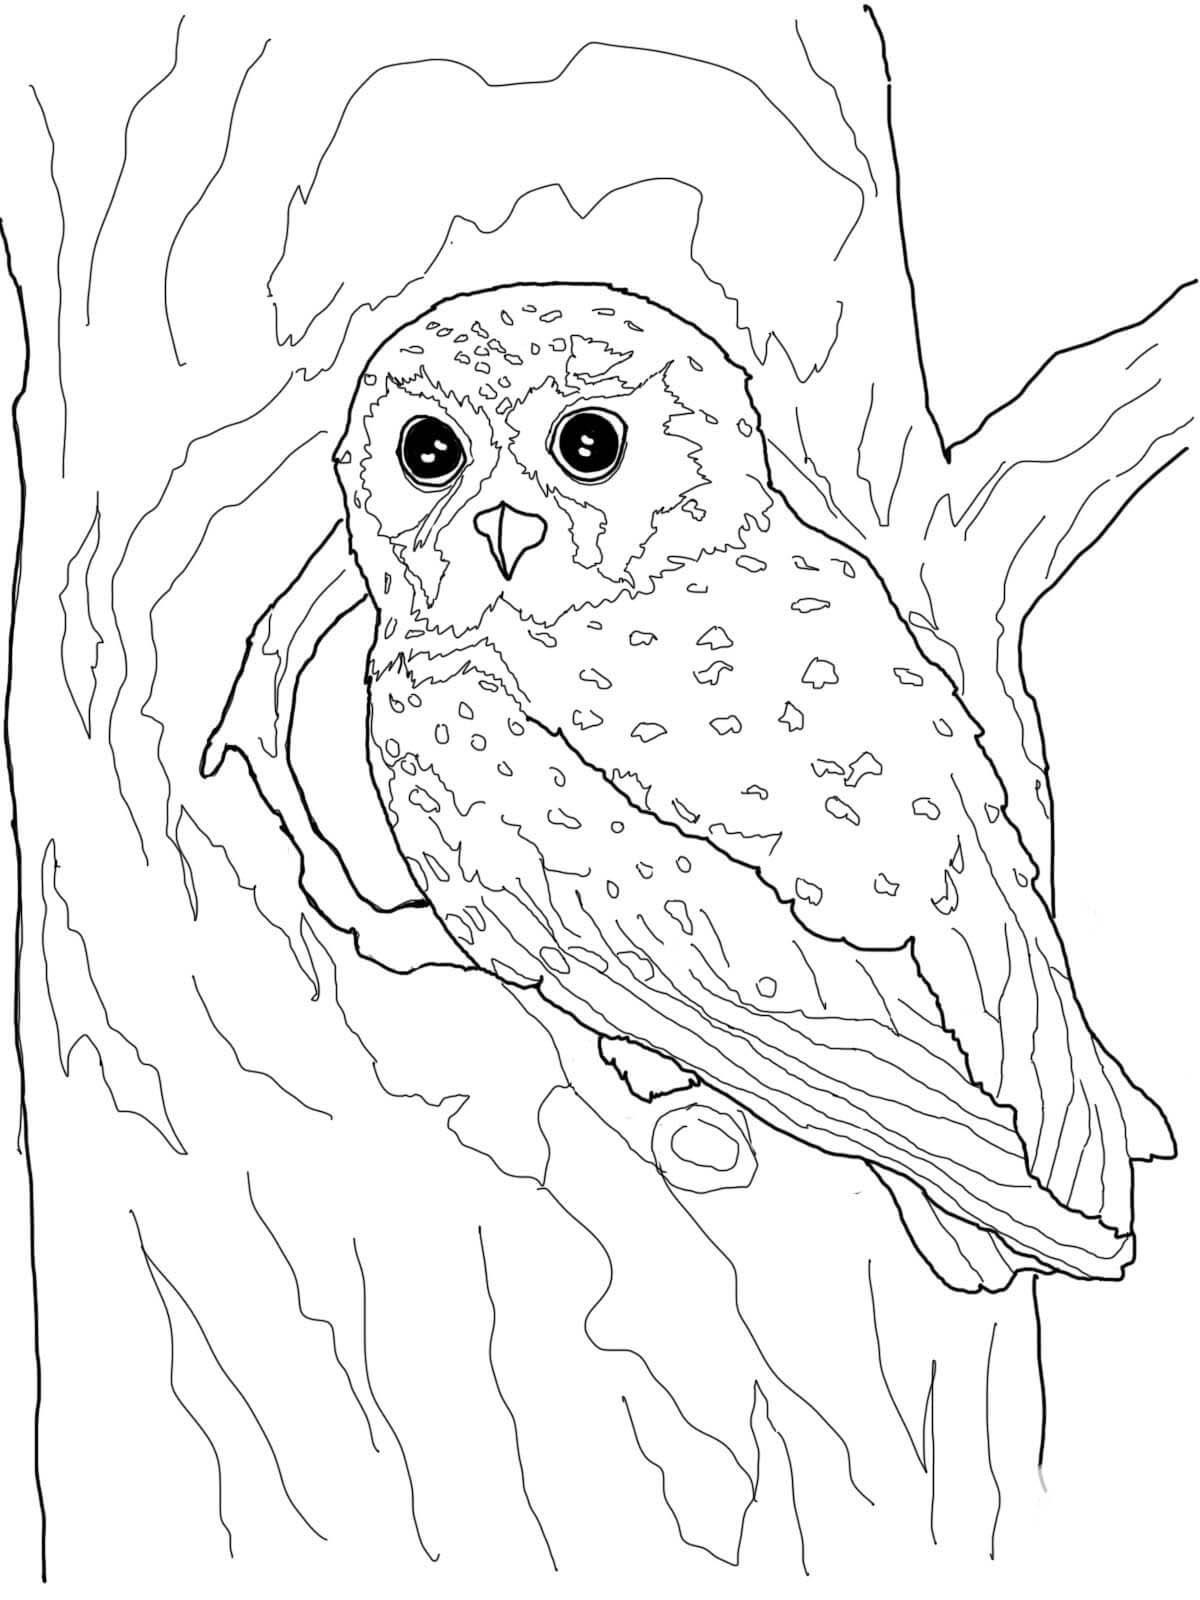 desenho de coruja na casa da árvore para colorir tudodesenhos